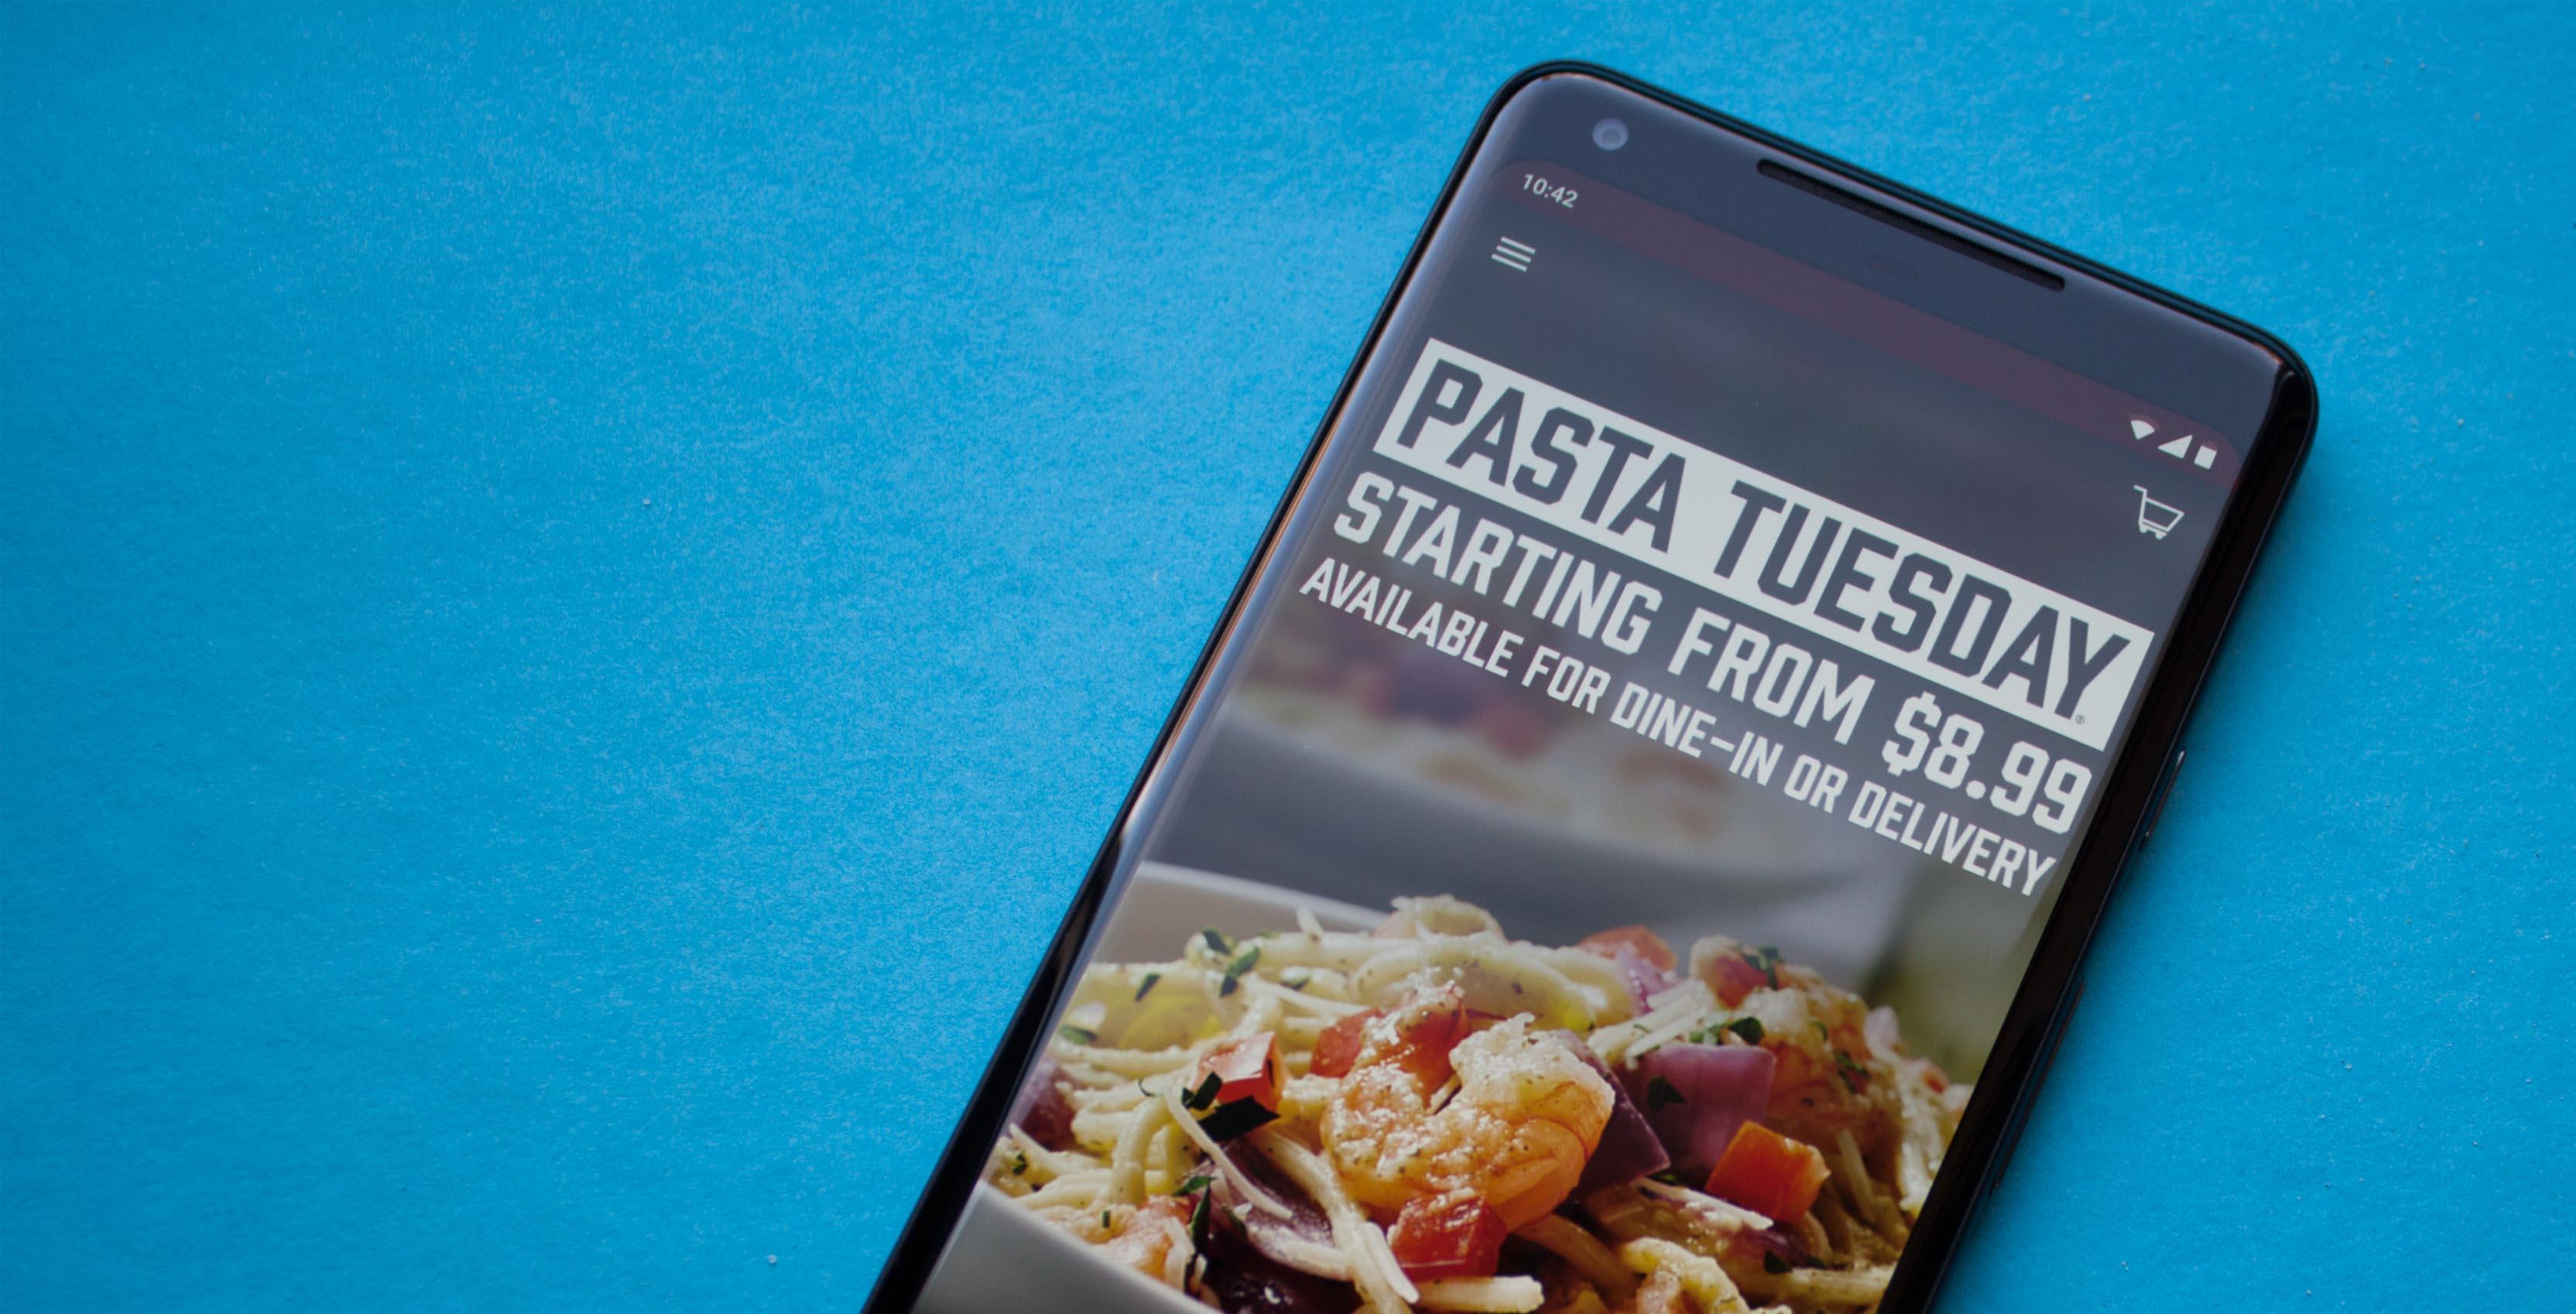 Boston Pizza smart phone application